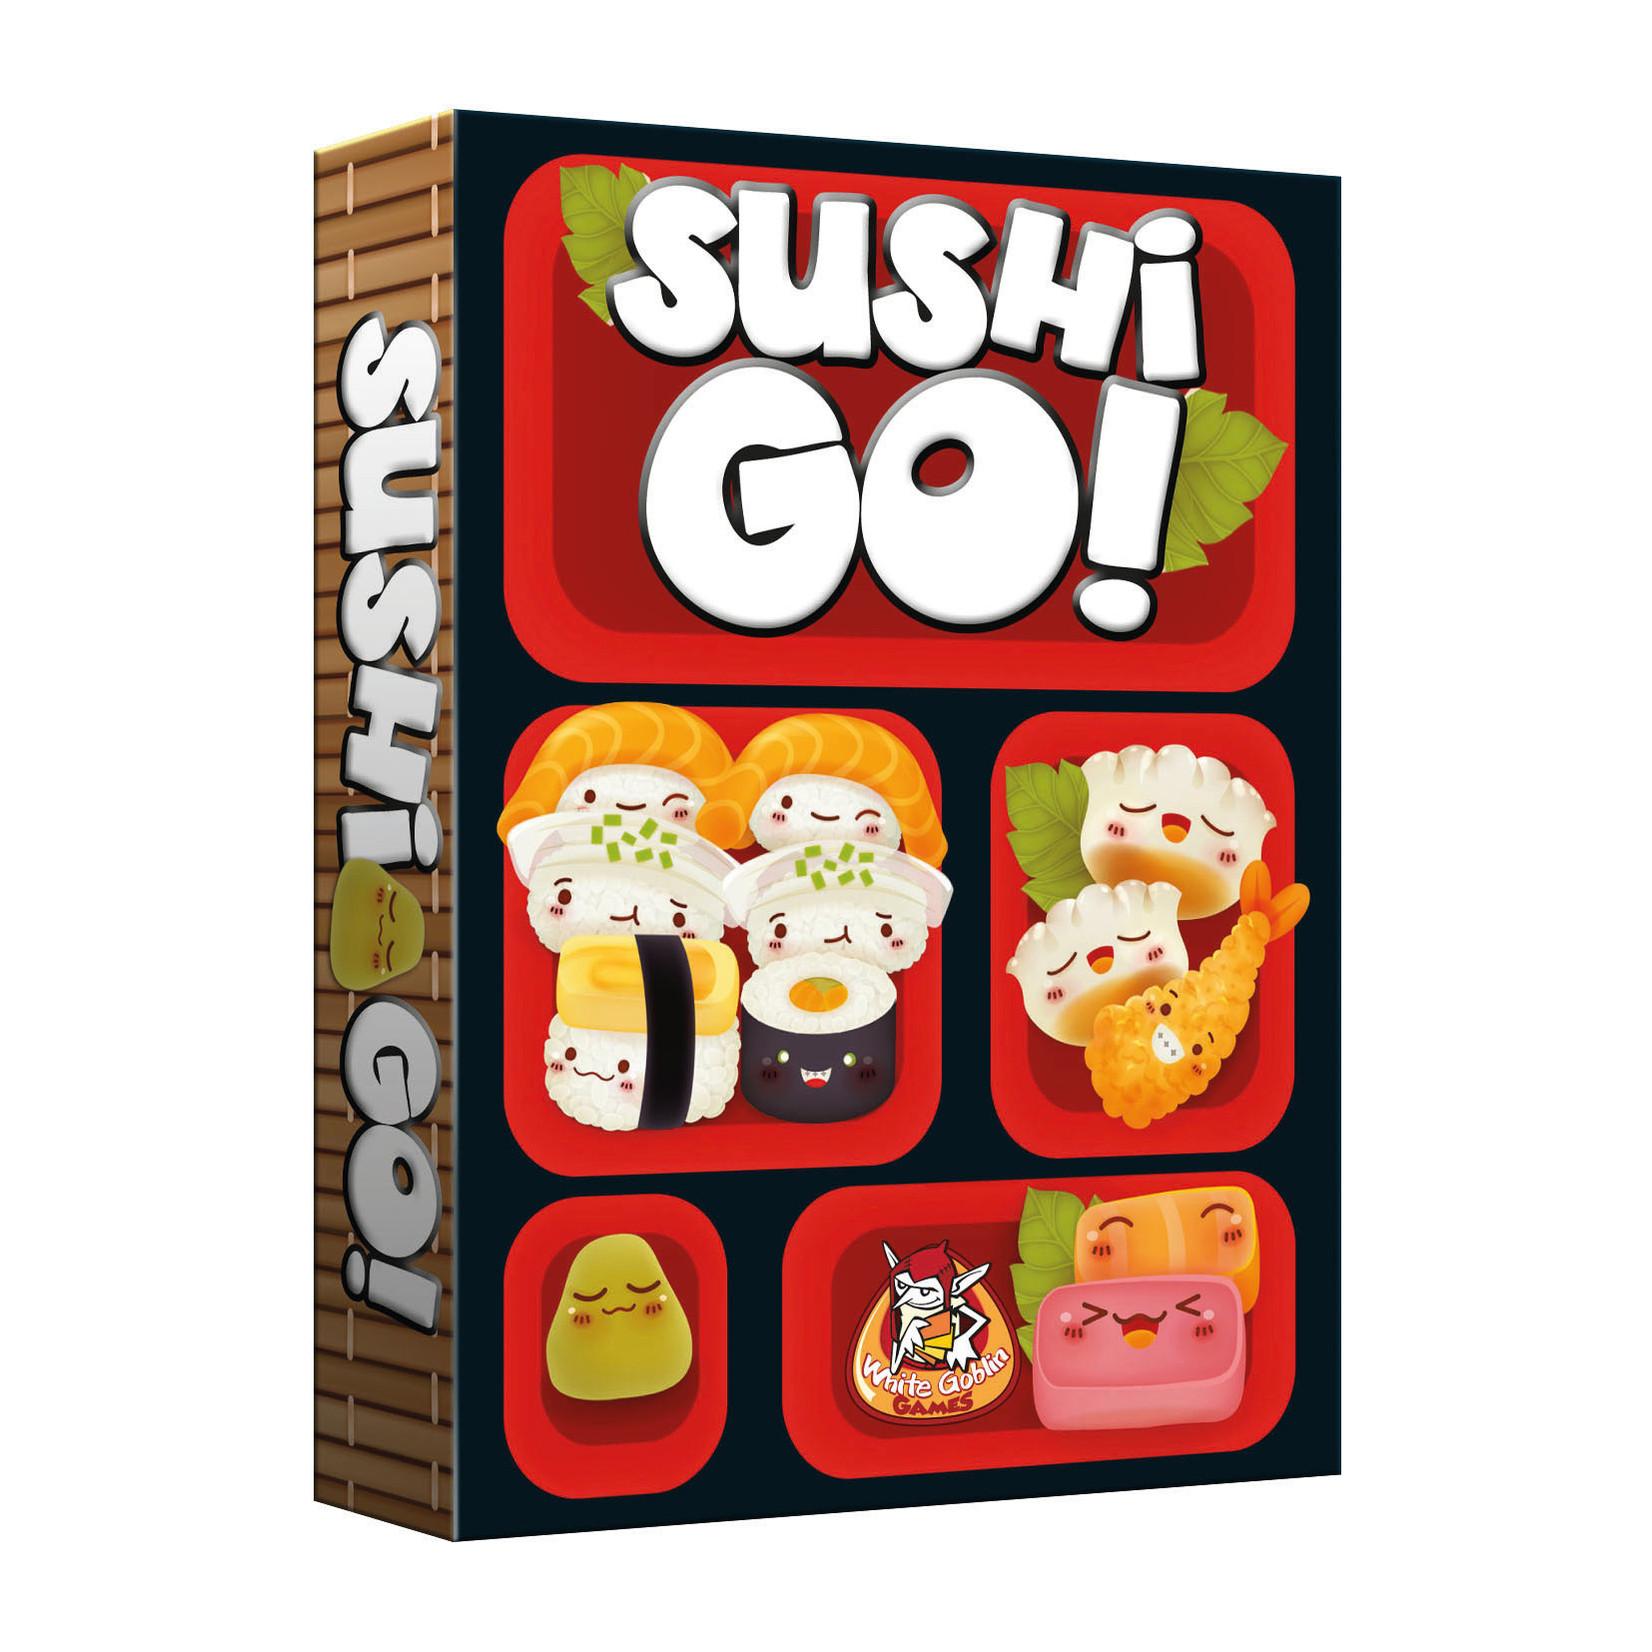 White Goblin Sushi Go!